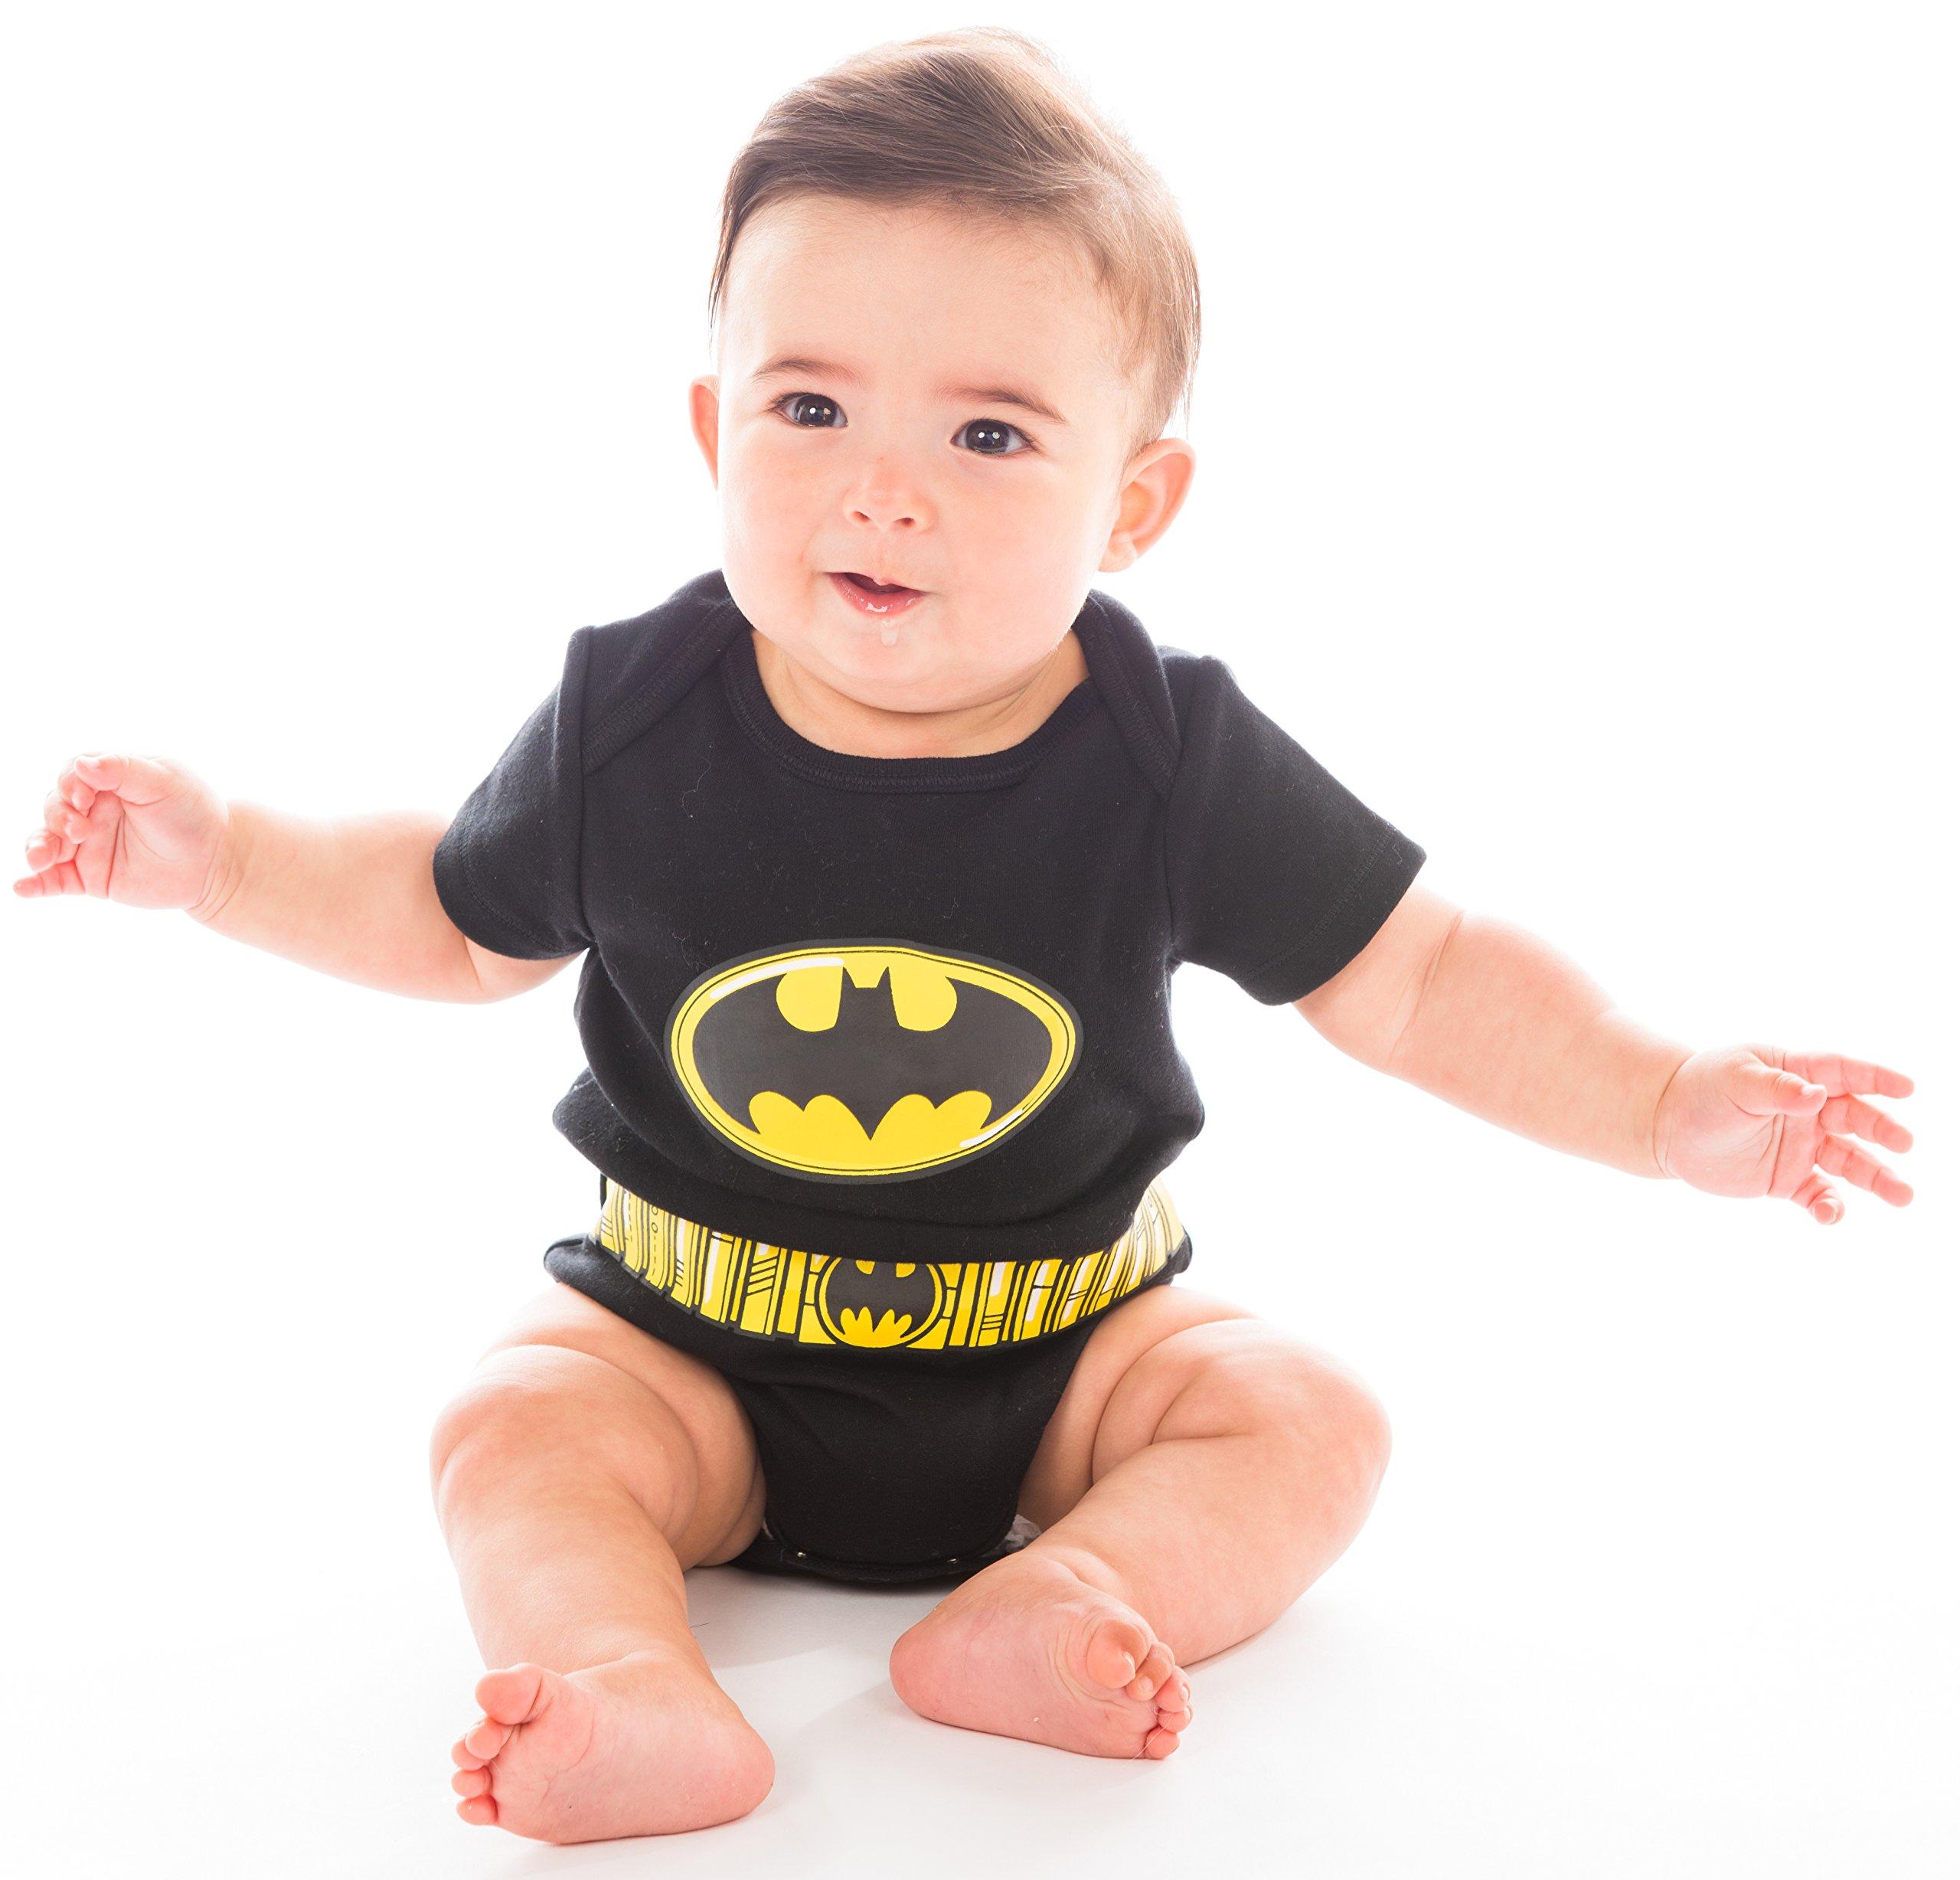 Justice League Baby Boys' 5 Pack Superhero Onesies - Batman, Superman, The Flash and Green Lantern (6-9M) by Warner Bros. (Image #7)